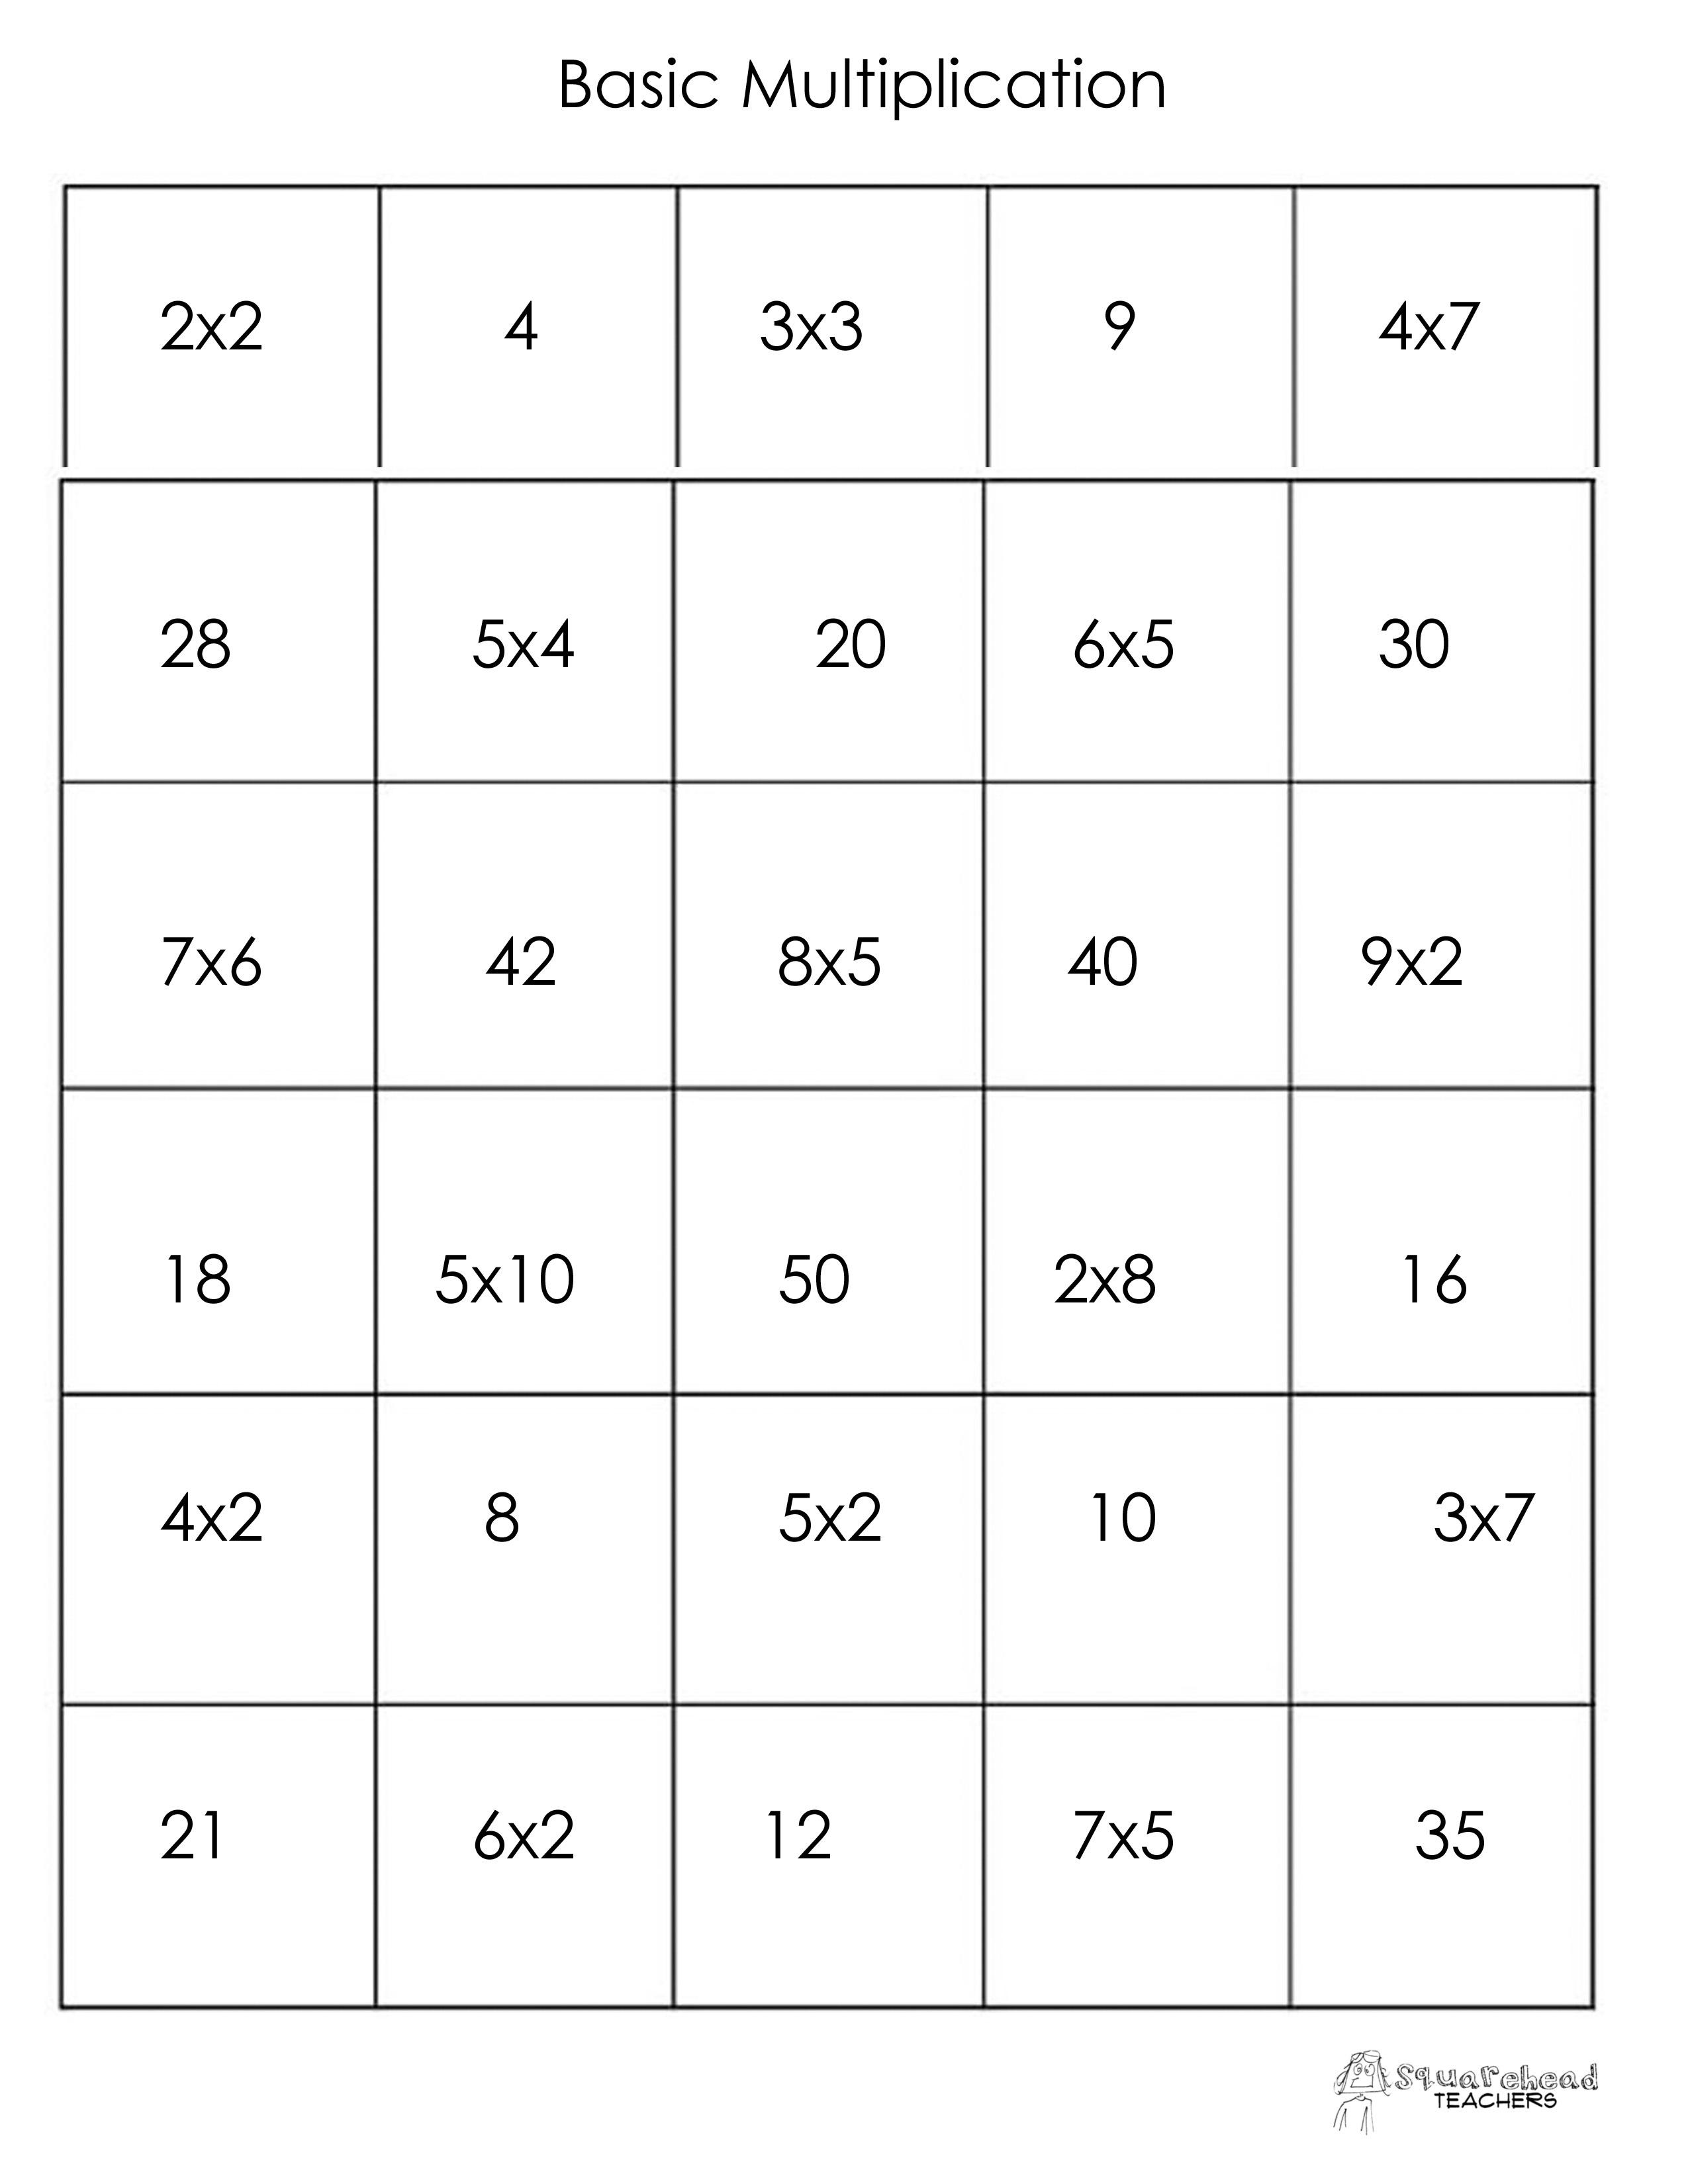 Thanksgiving Math Memory Game (Free Printable)   Squarehead Teachers - Free Printable Thanksgiving Math Worksheets For 3Rd Grade